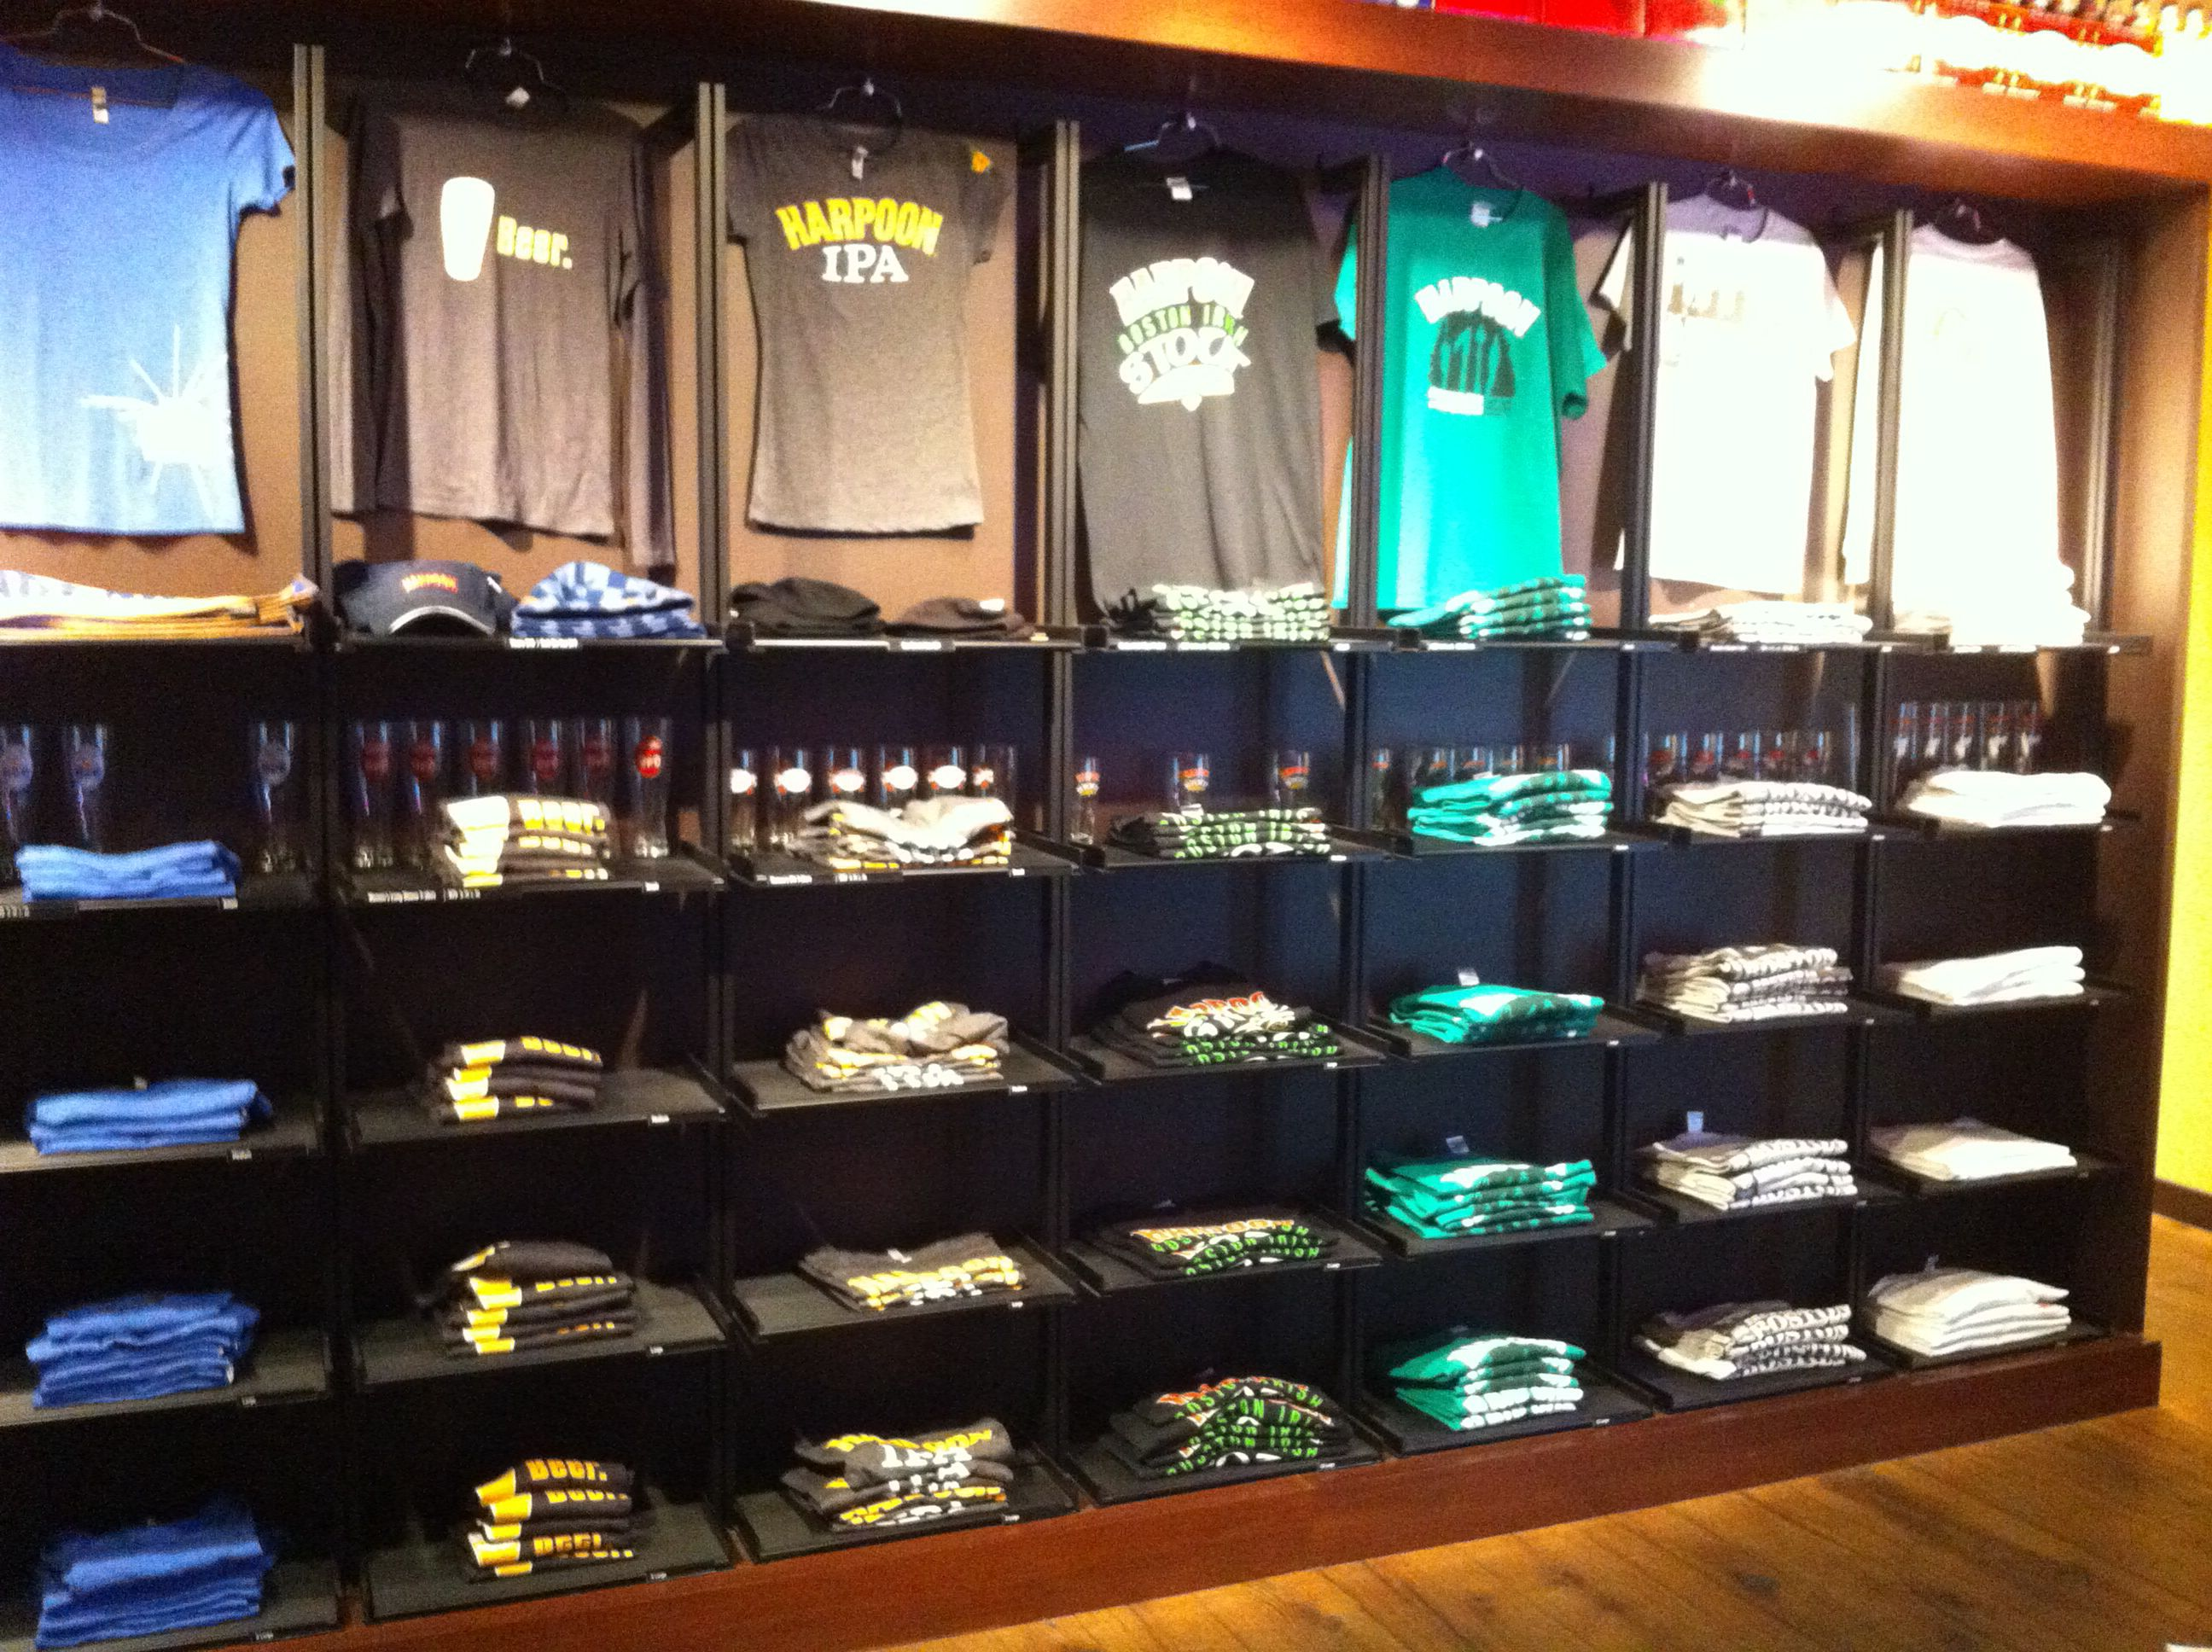 Tshirt wall Harpoon Brewery gift shop Boston, MA Gift